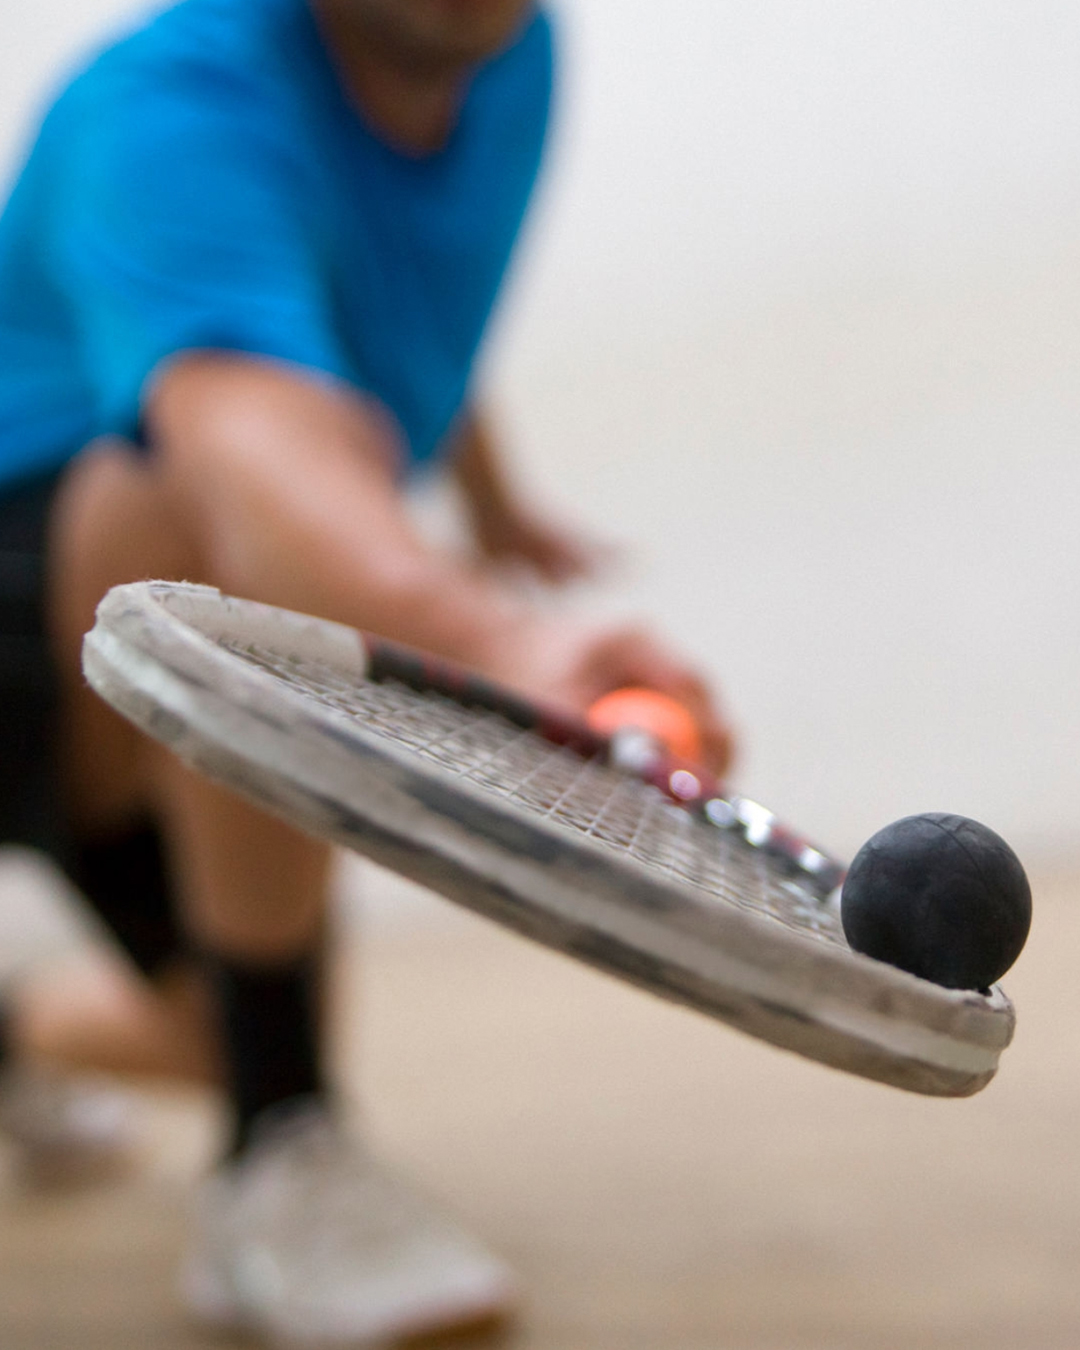 racket repair and stringing service